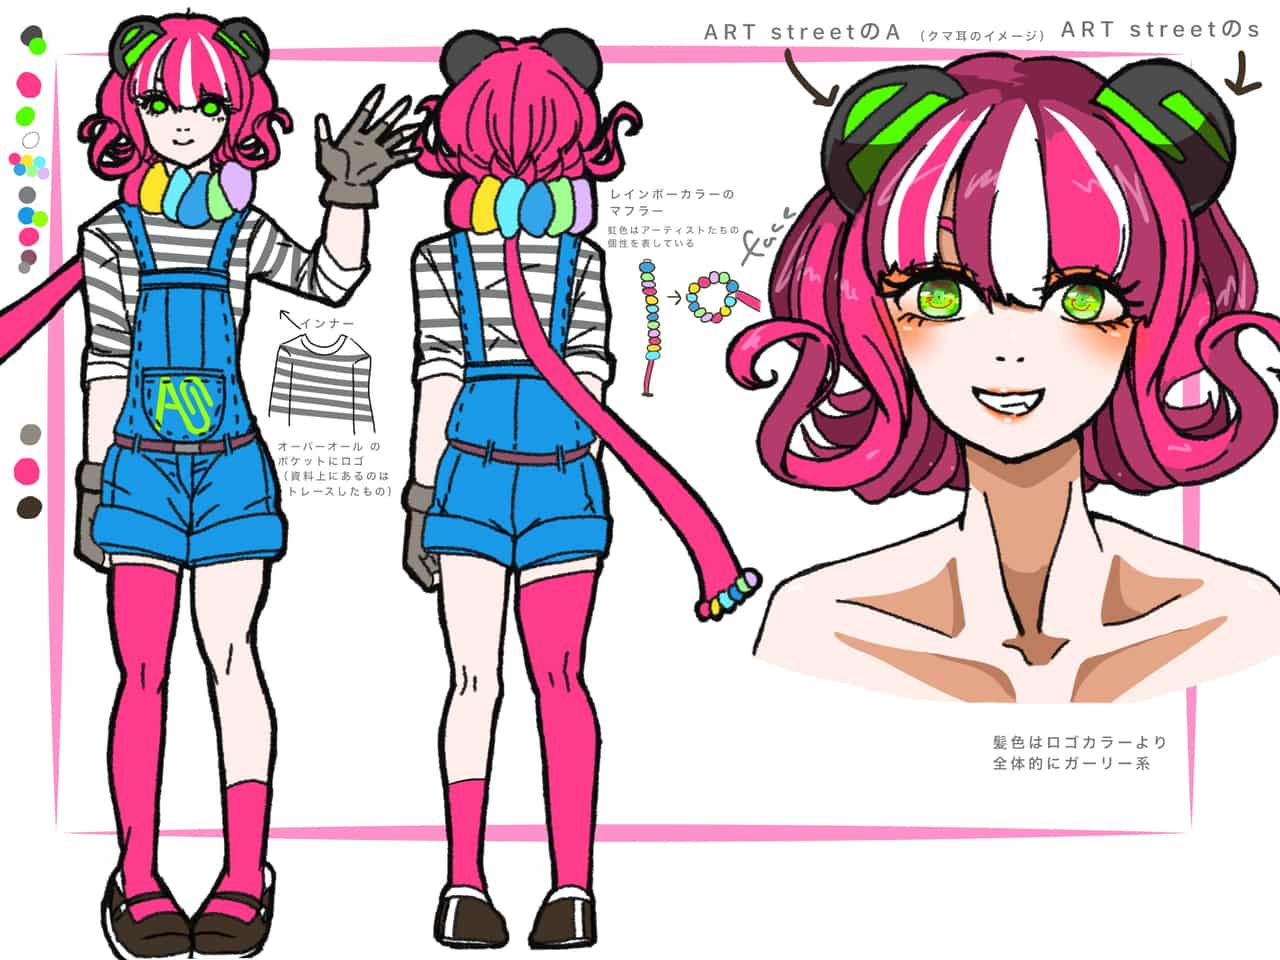 ART street キャラクターデザイン